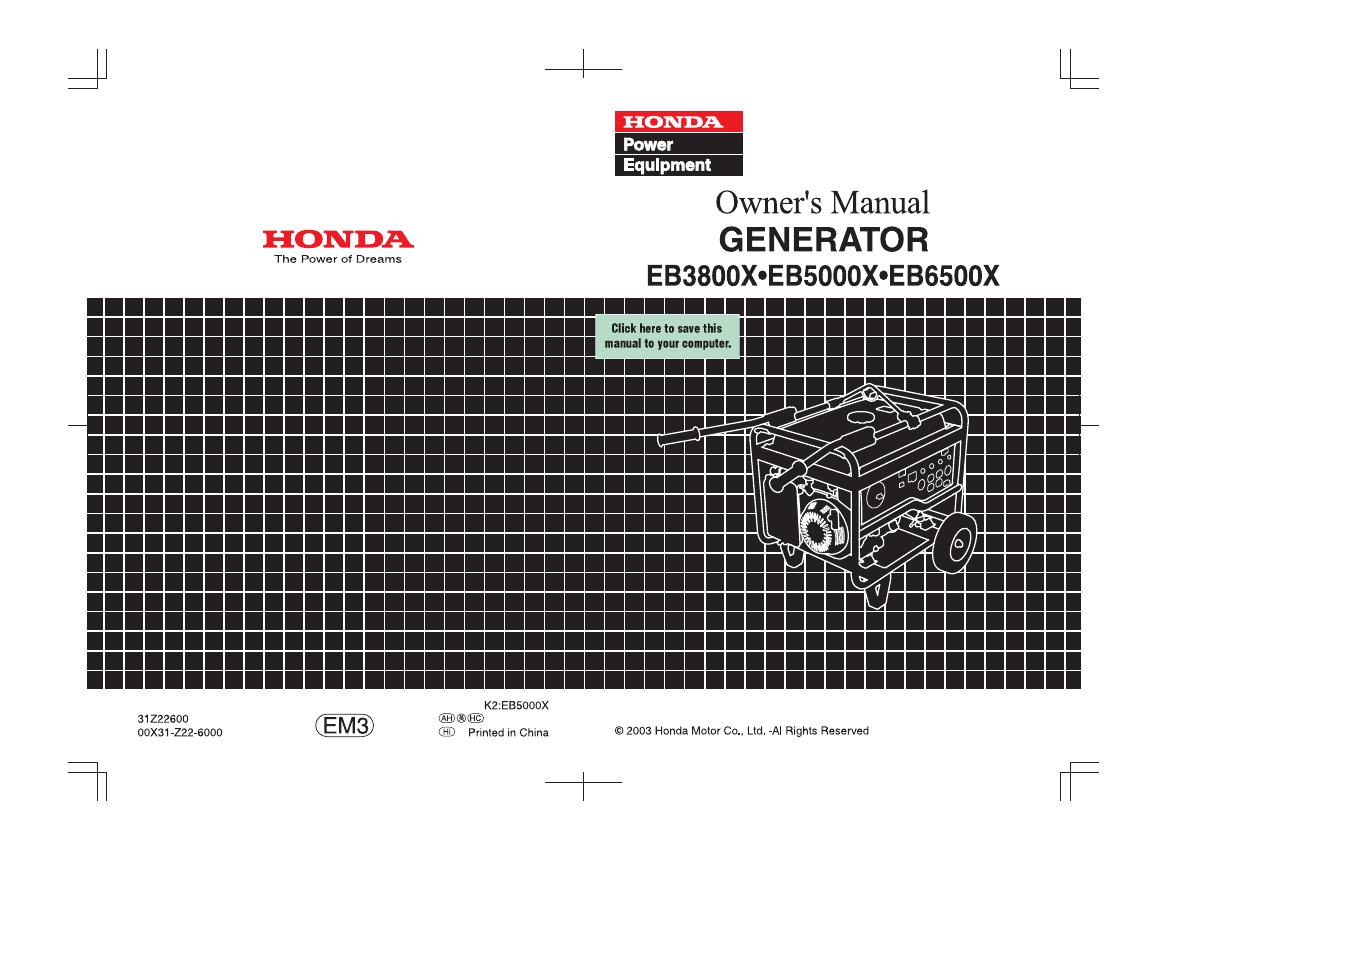 honda eb6500x user manual 75 pages rh manualsdir com honda eb6500x service manual honda eb6500x parts manual